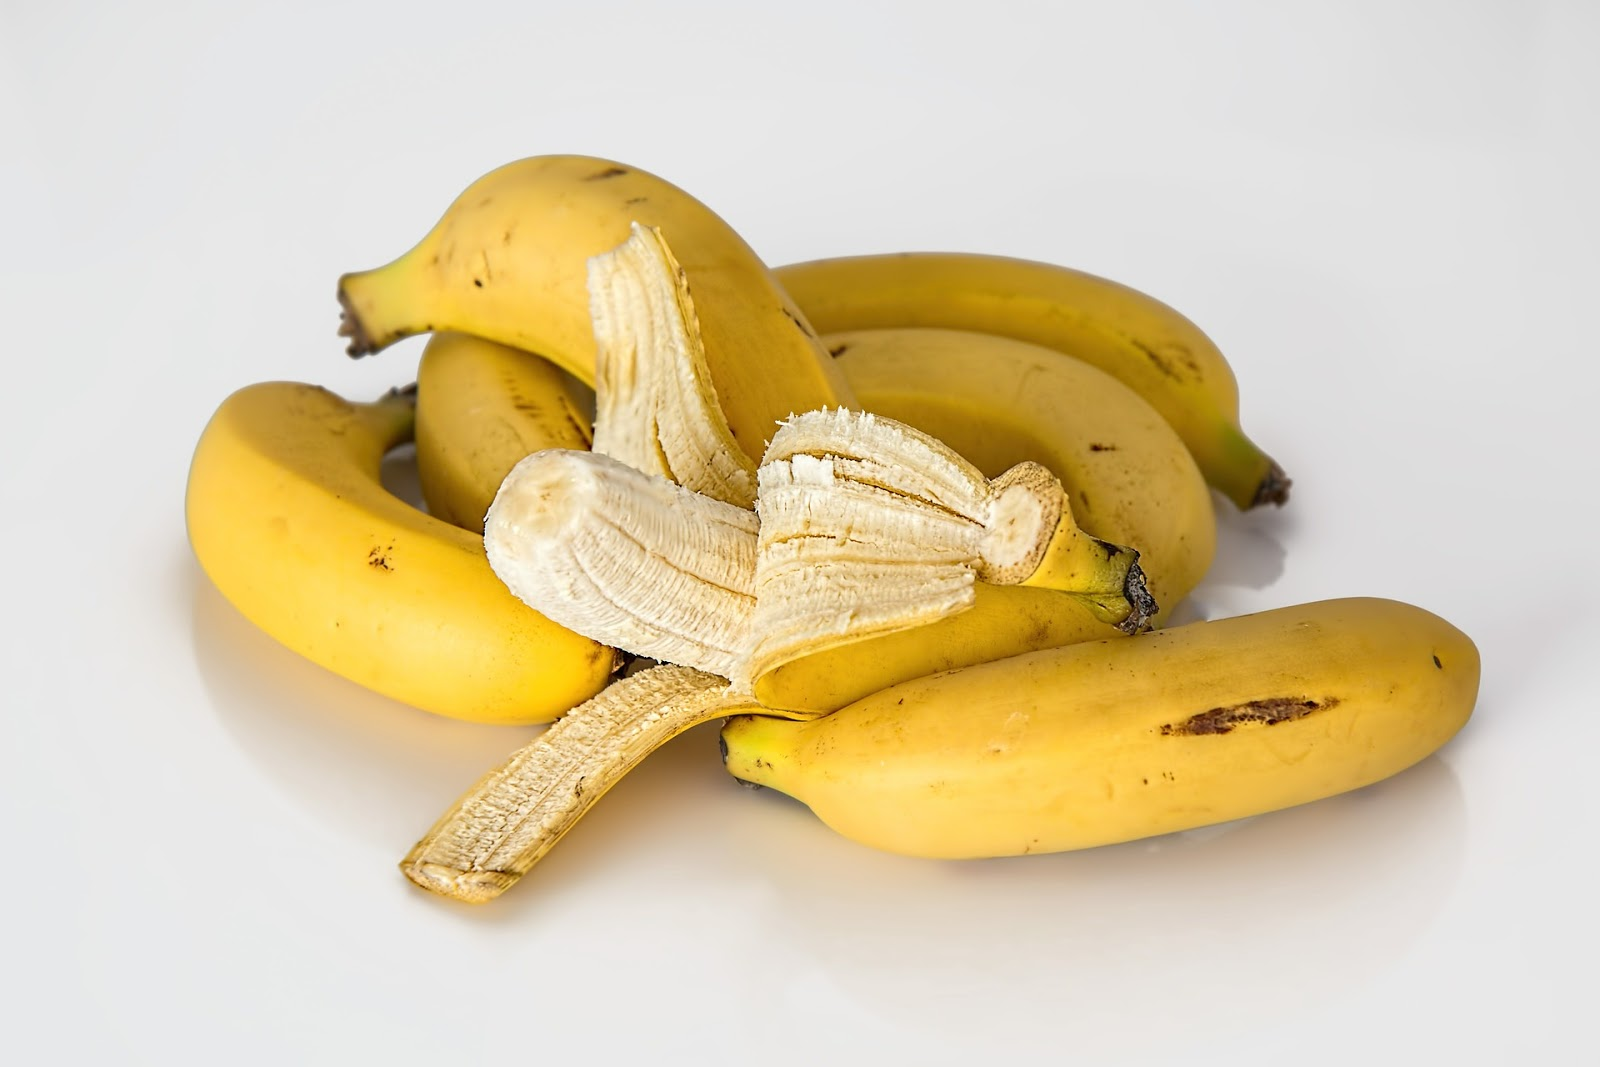 Banana a Fruit or Vegetable